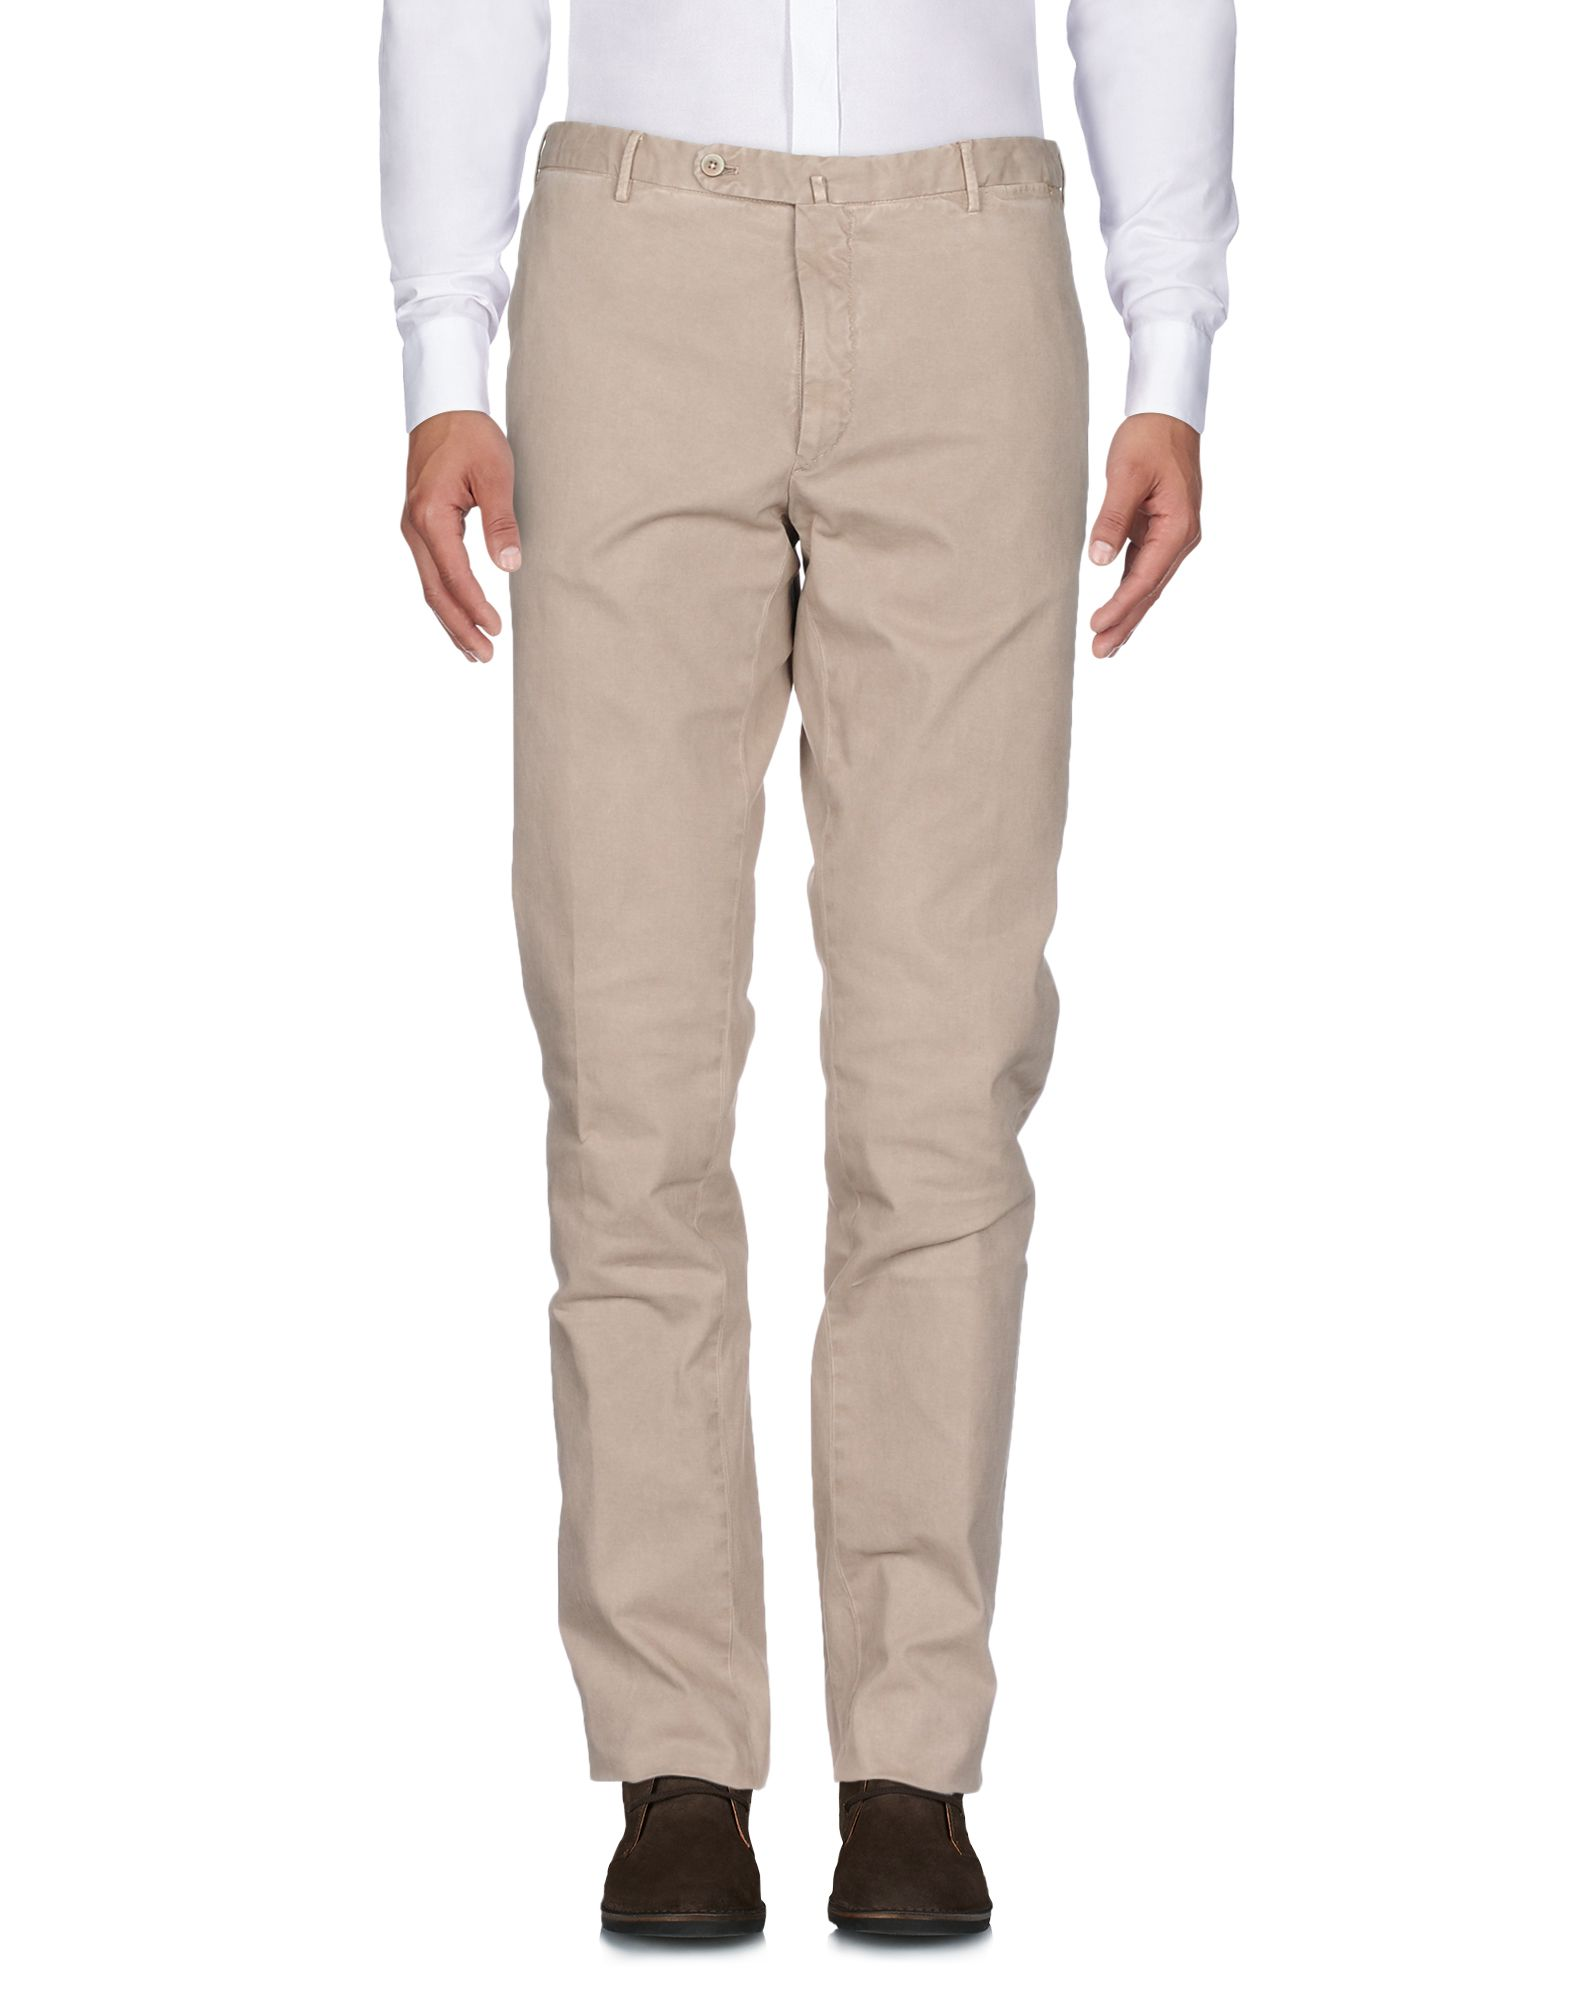 Chinos G.T.A. Manifattura Pantaloni Uomo - Acquista online su